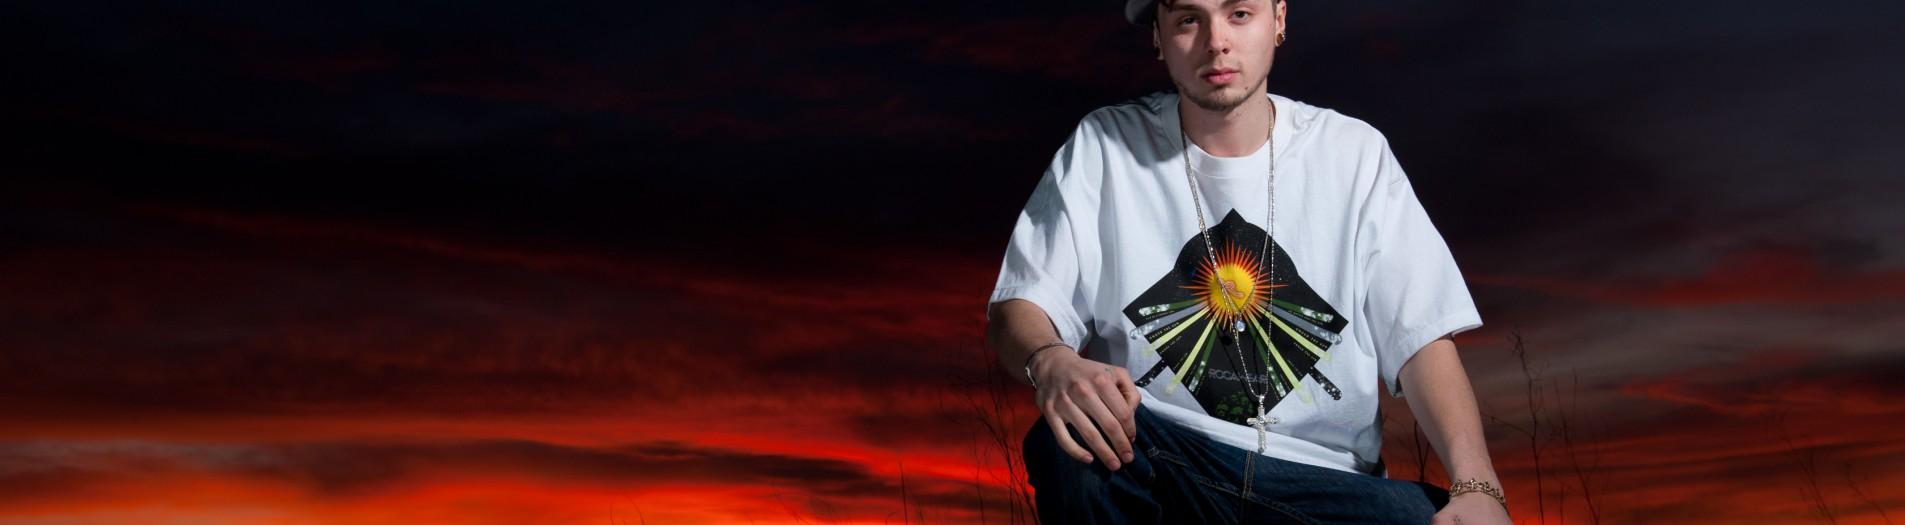 Chris Keyes Rapper/Entrepreneur